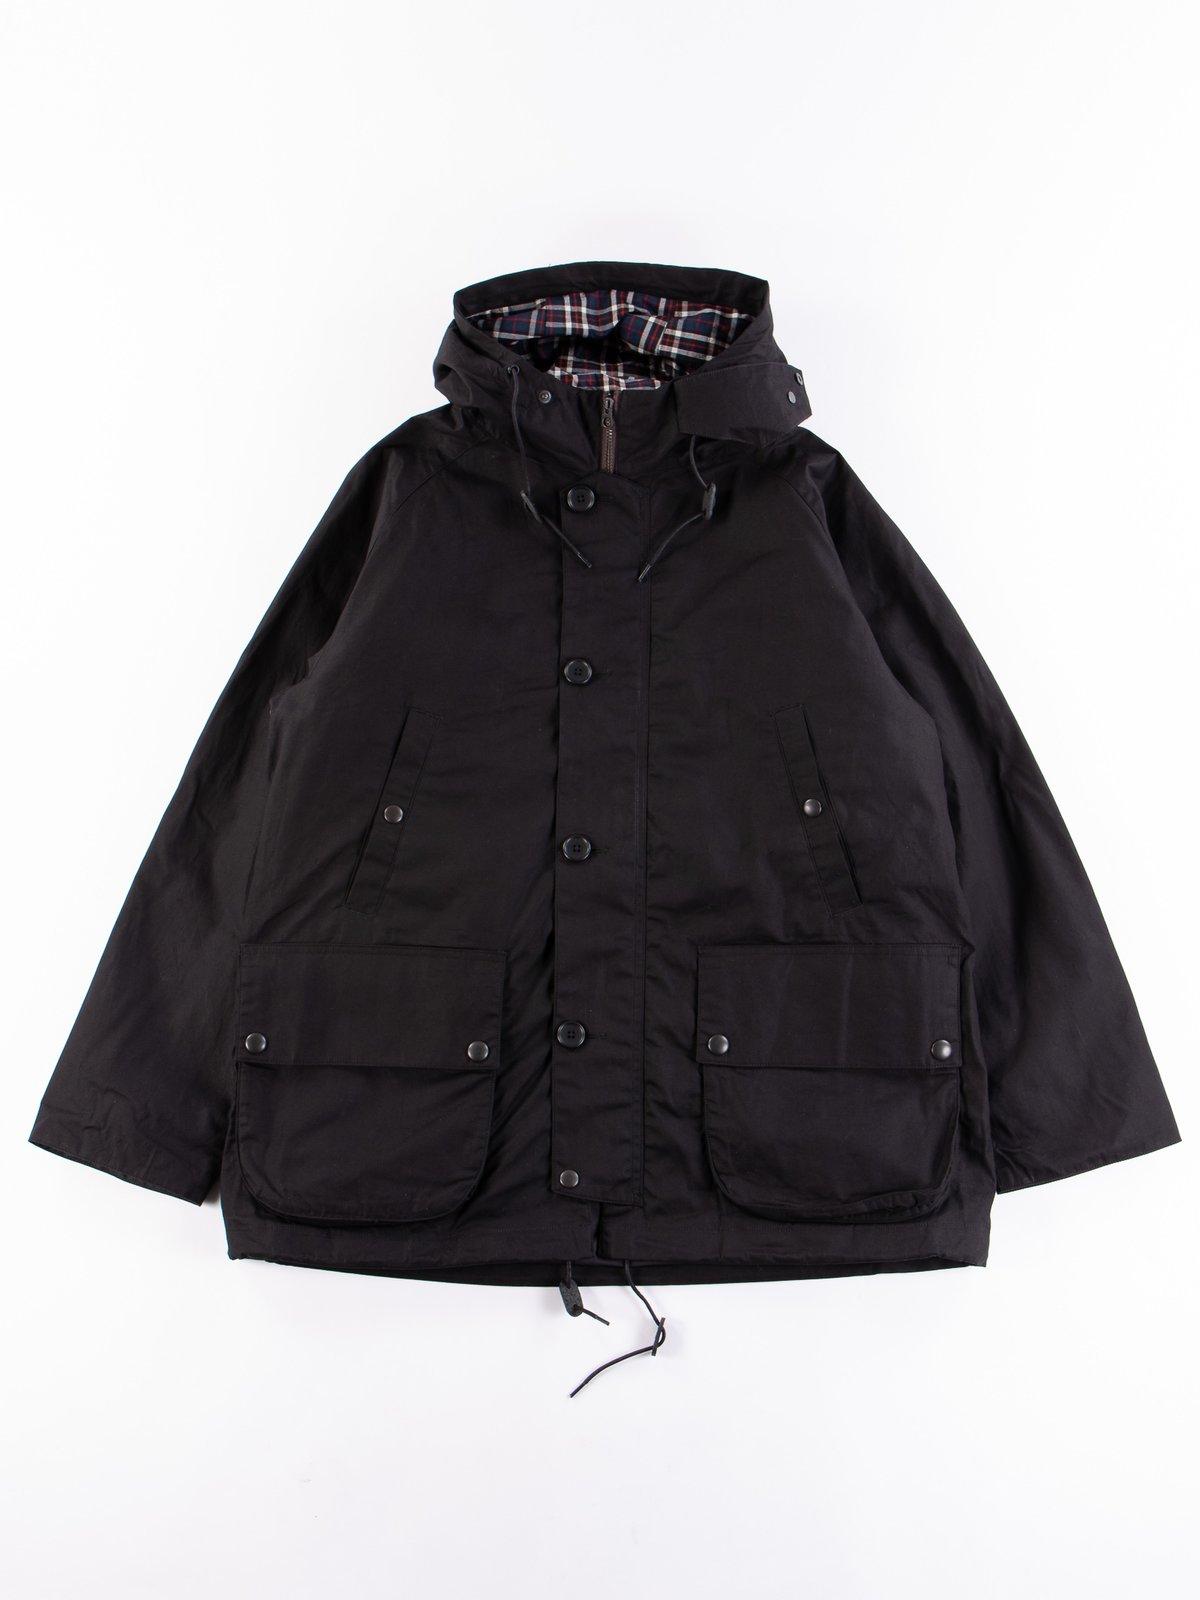 Black British Field Hooded Jacket - Image 1